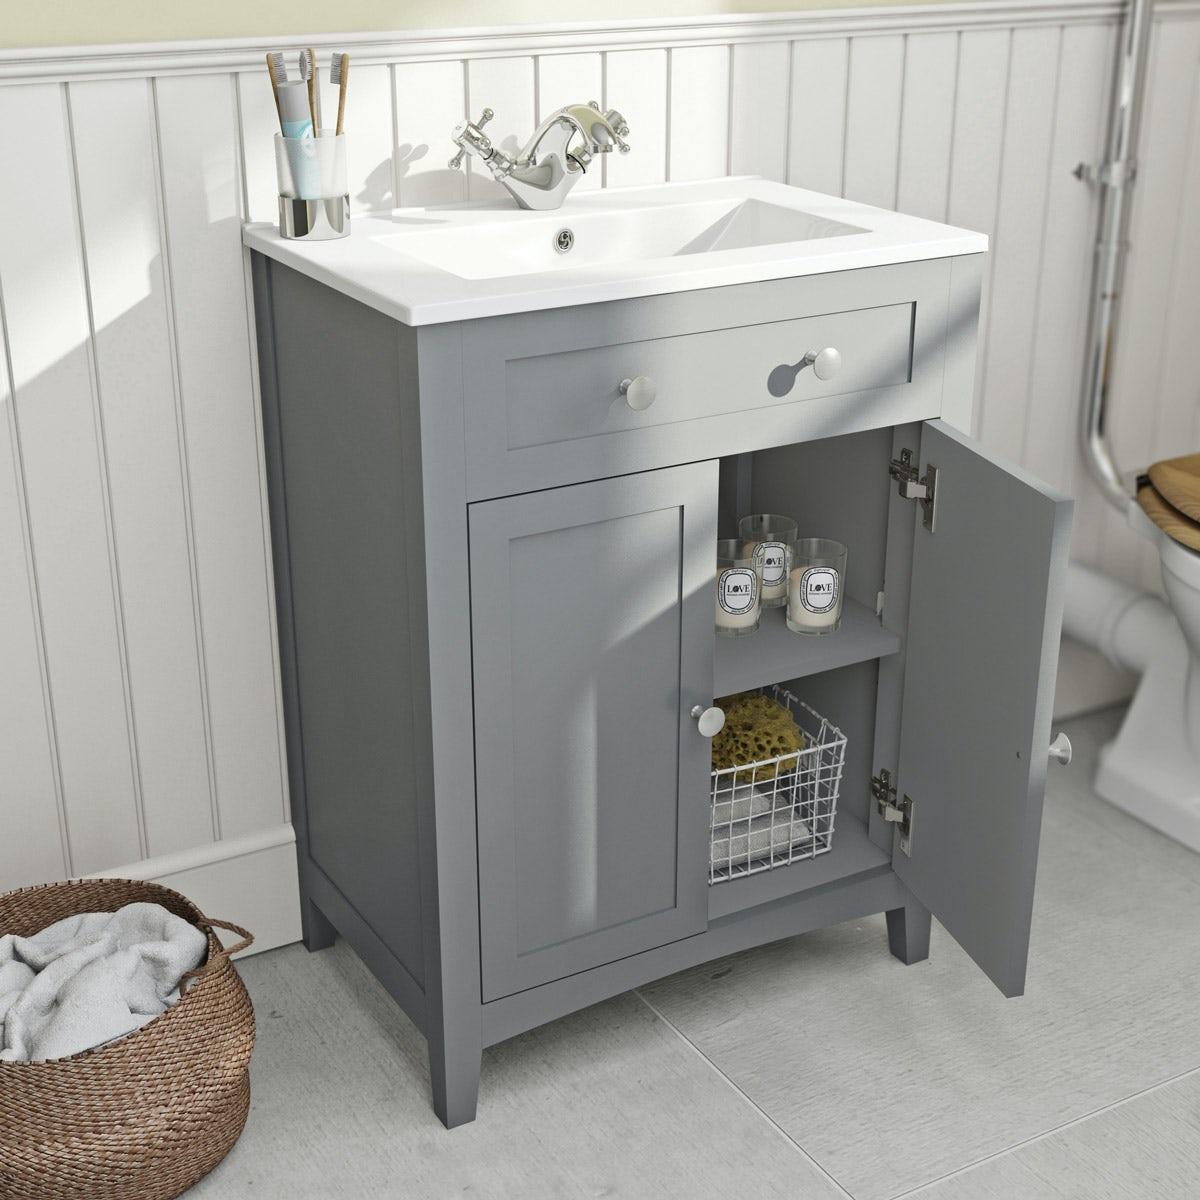 Vanity Unit Bathroom Grey the bath co. camberley grey vanity unit with basin 600mm